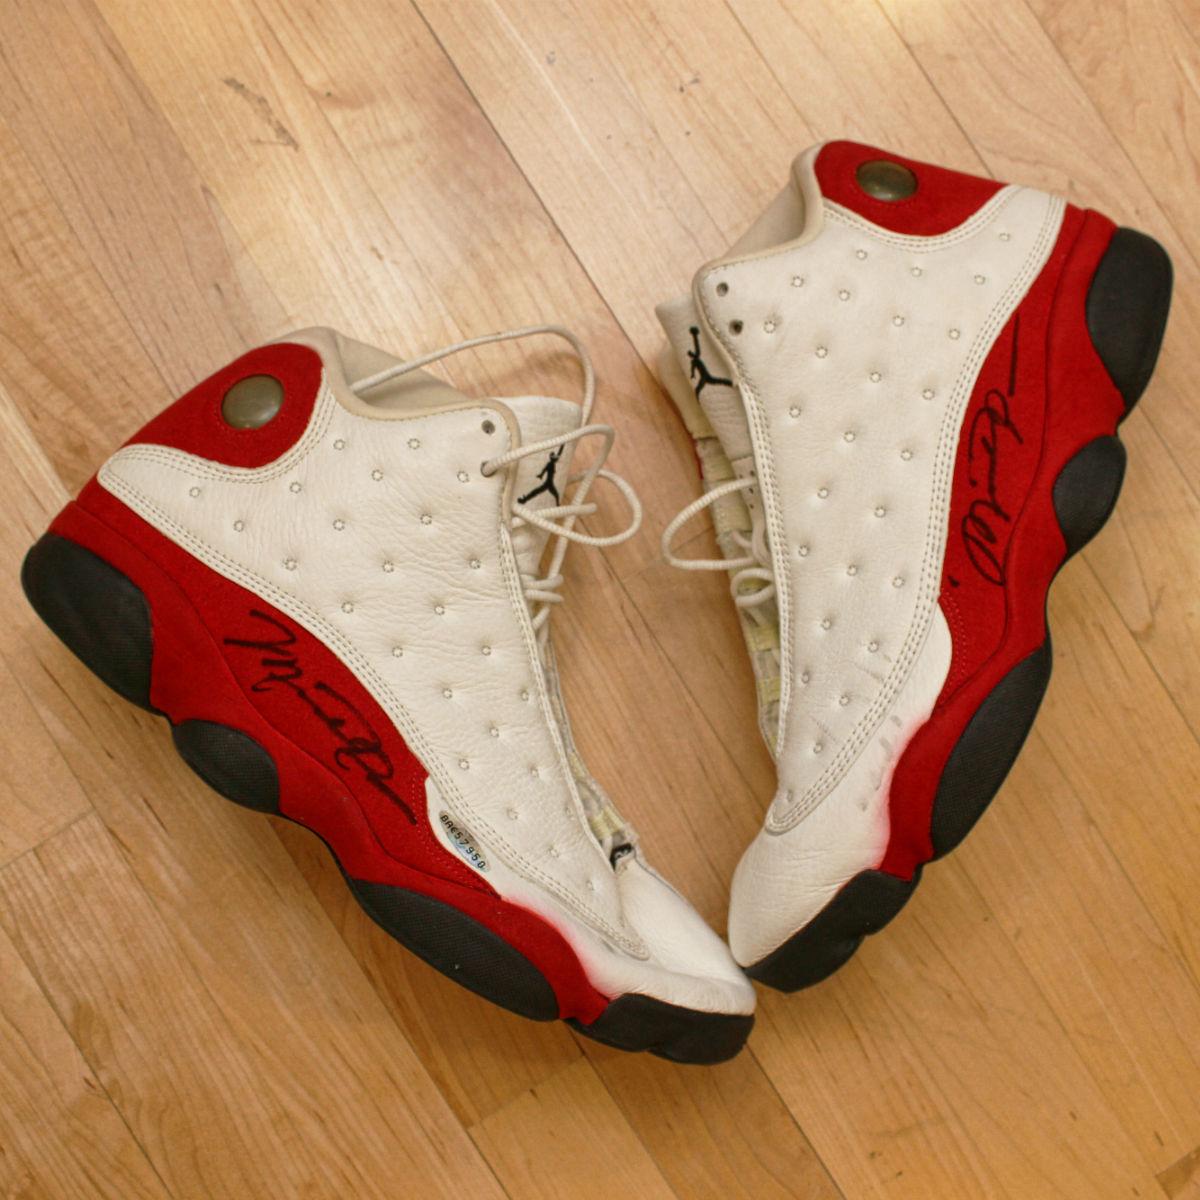 Game-Worn Air Jordan 13 White/Red 1997-98 Autographs